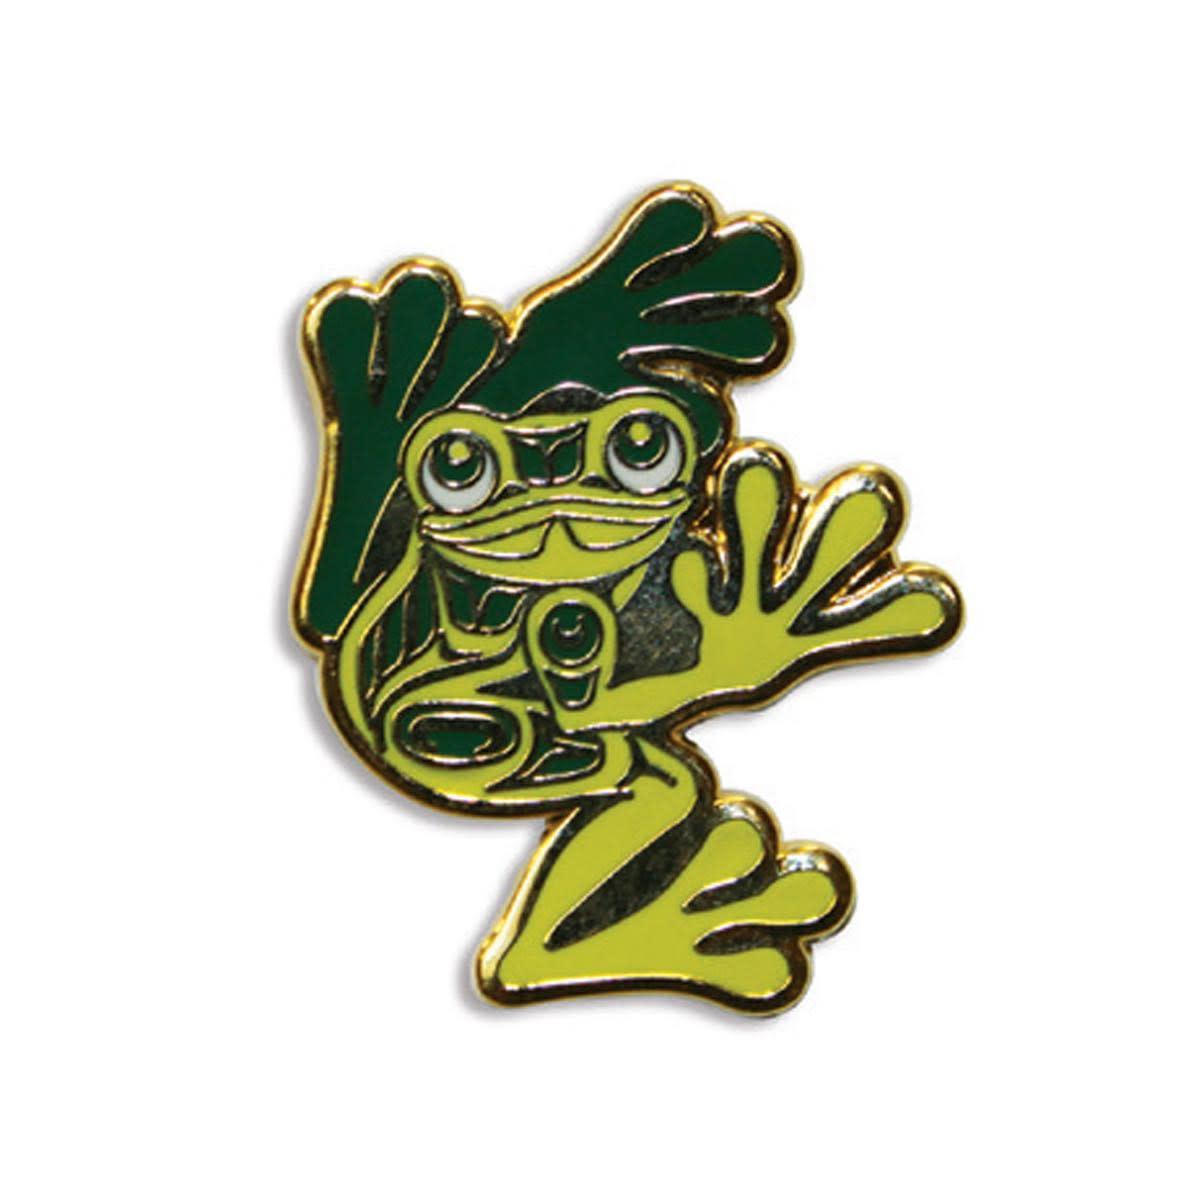 Enamel Pin Frog- Corey W. Moraes-2